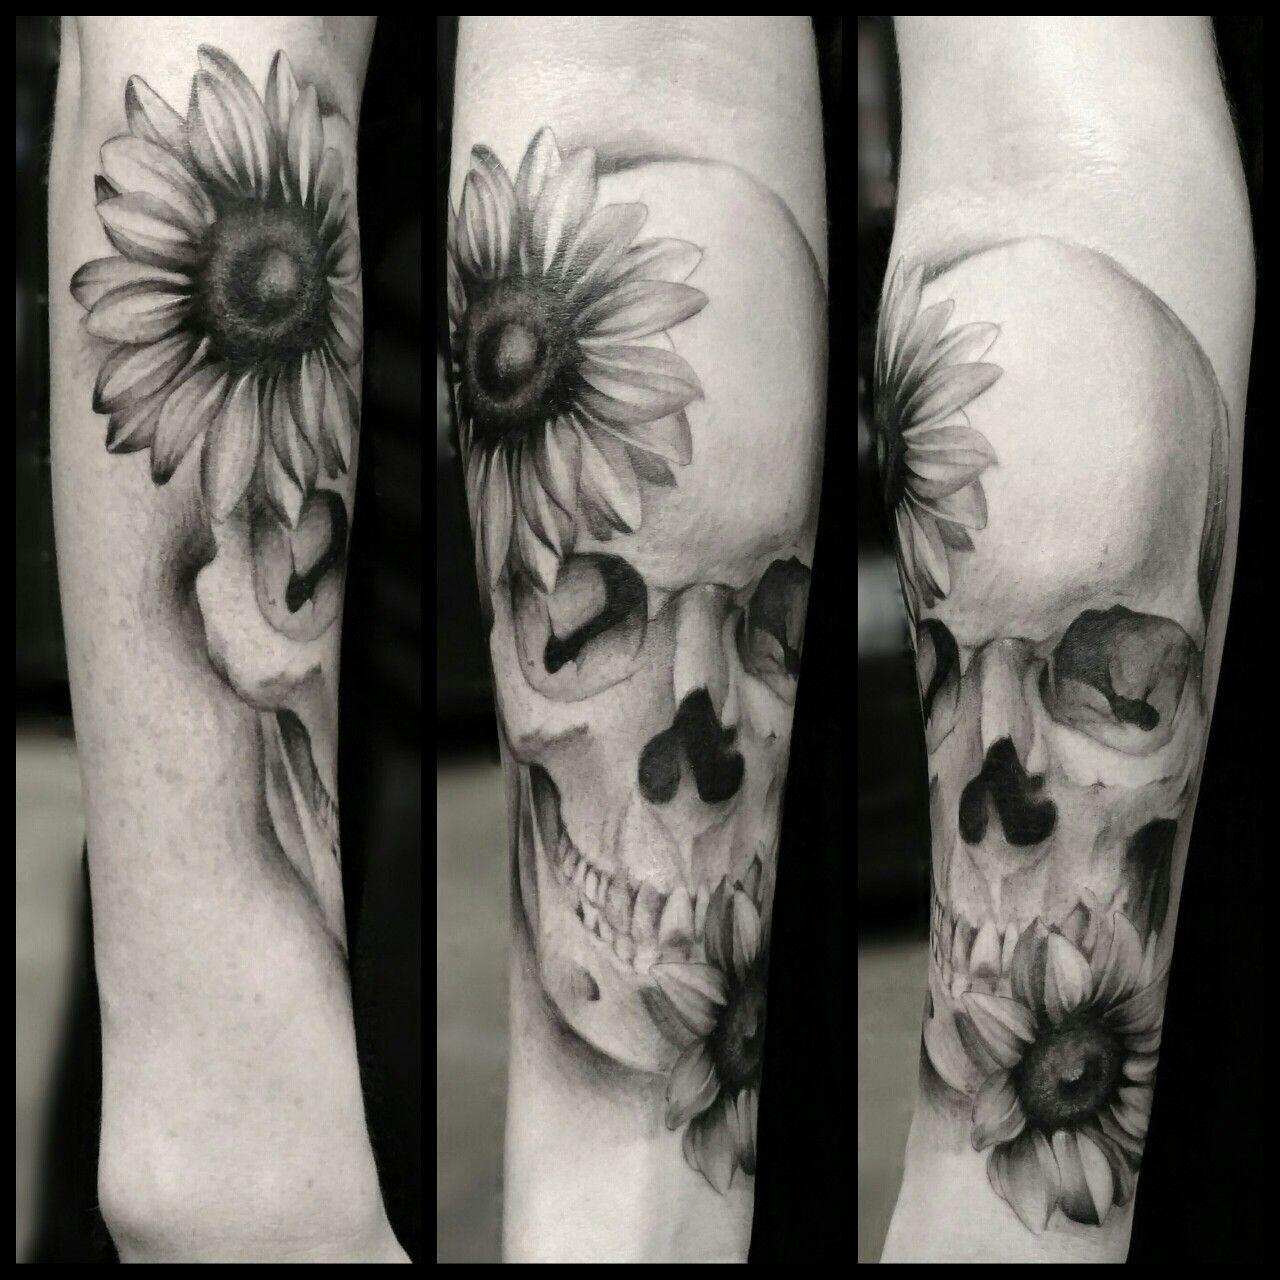 #sunflowers #skulltattoos #flowertattoos #floraltattoos #blackandgreytattoos #blackandgraytattoos #skulls #skull #tattoo #tattoos #flowertattoo   Artist: Damien Ornelas  Instagram: damienart  Tattoo Shop: My Tattoo (Huntington Beach, CA)